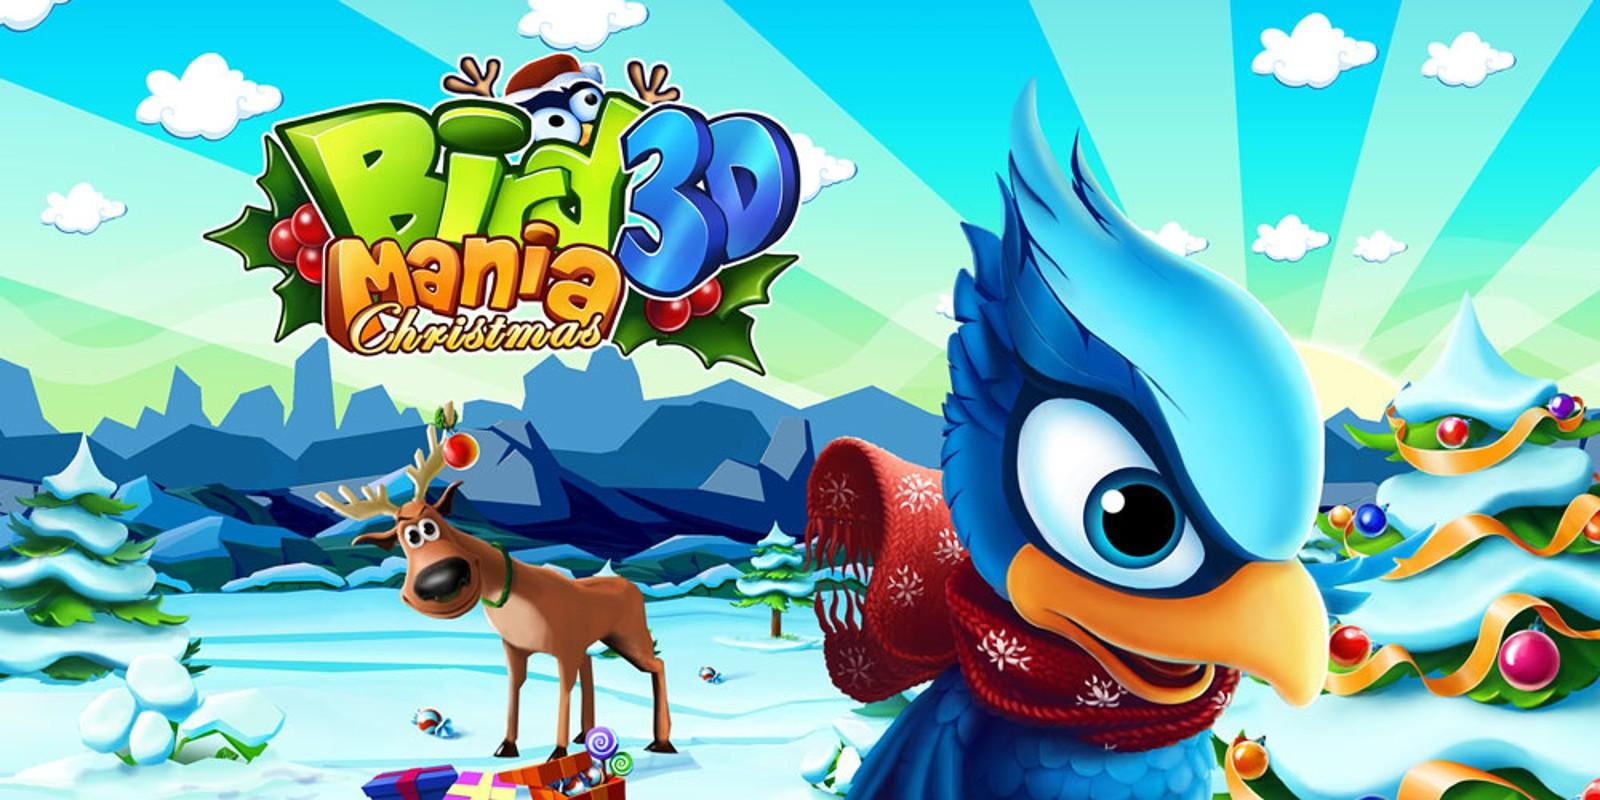 Bird Mania Christmas 3D | Nintendo 3DS download software | Games ...